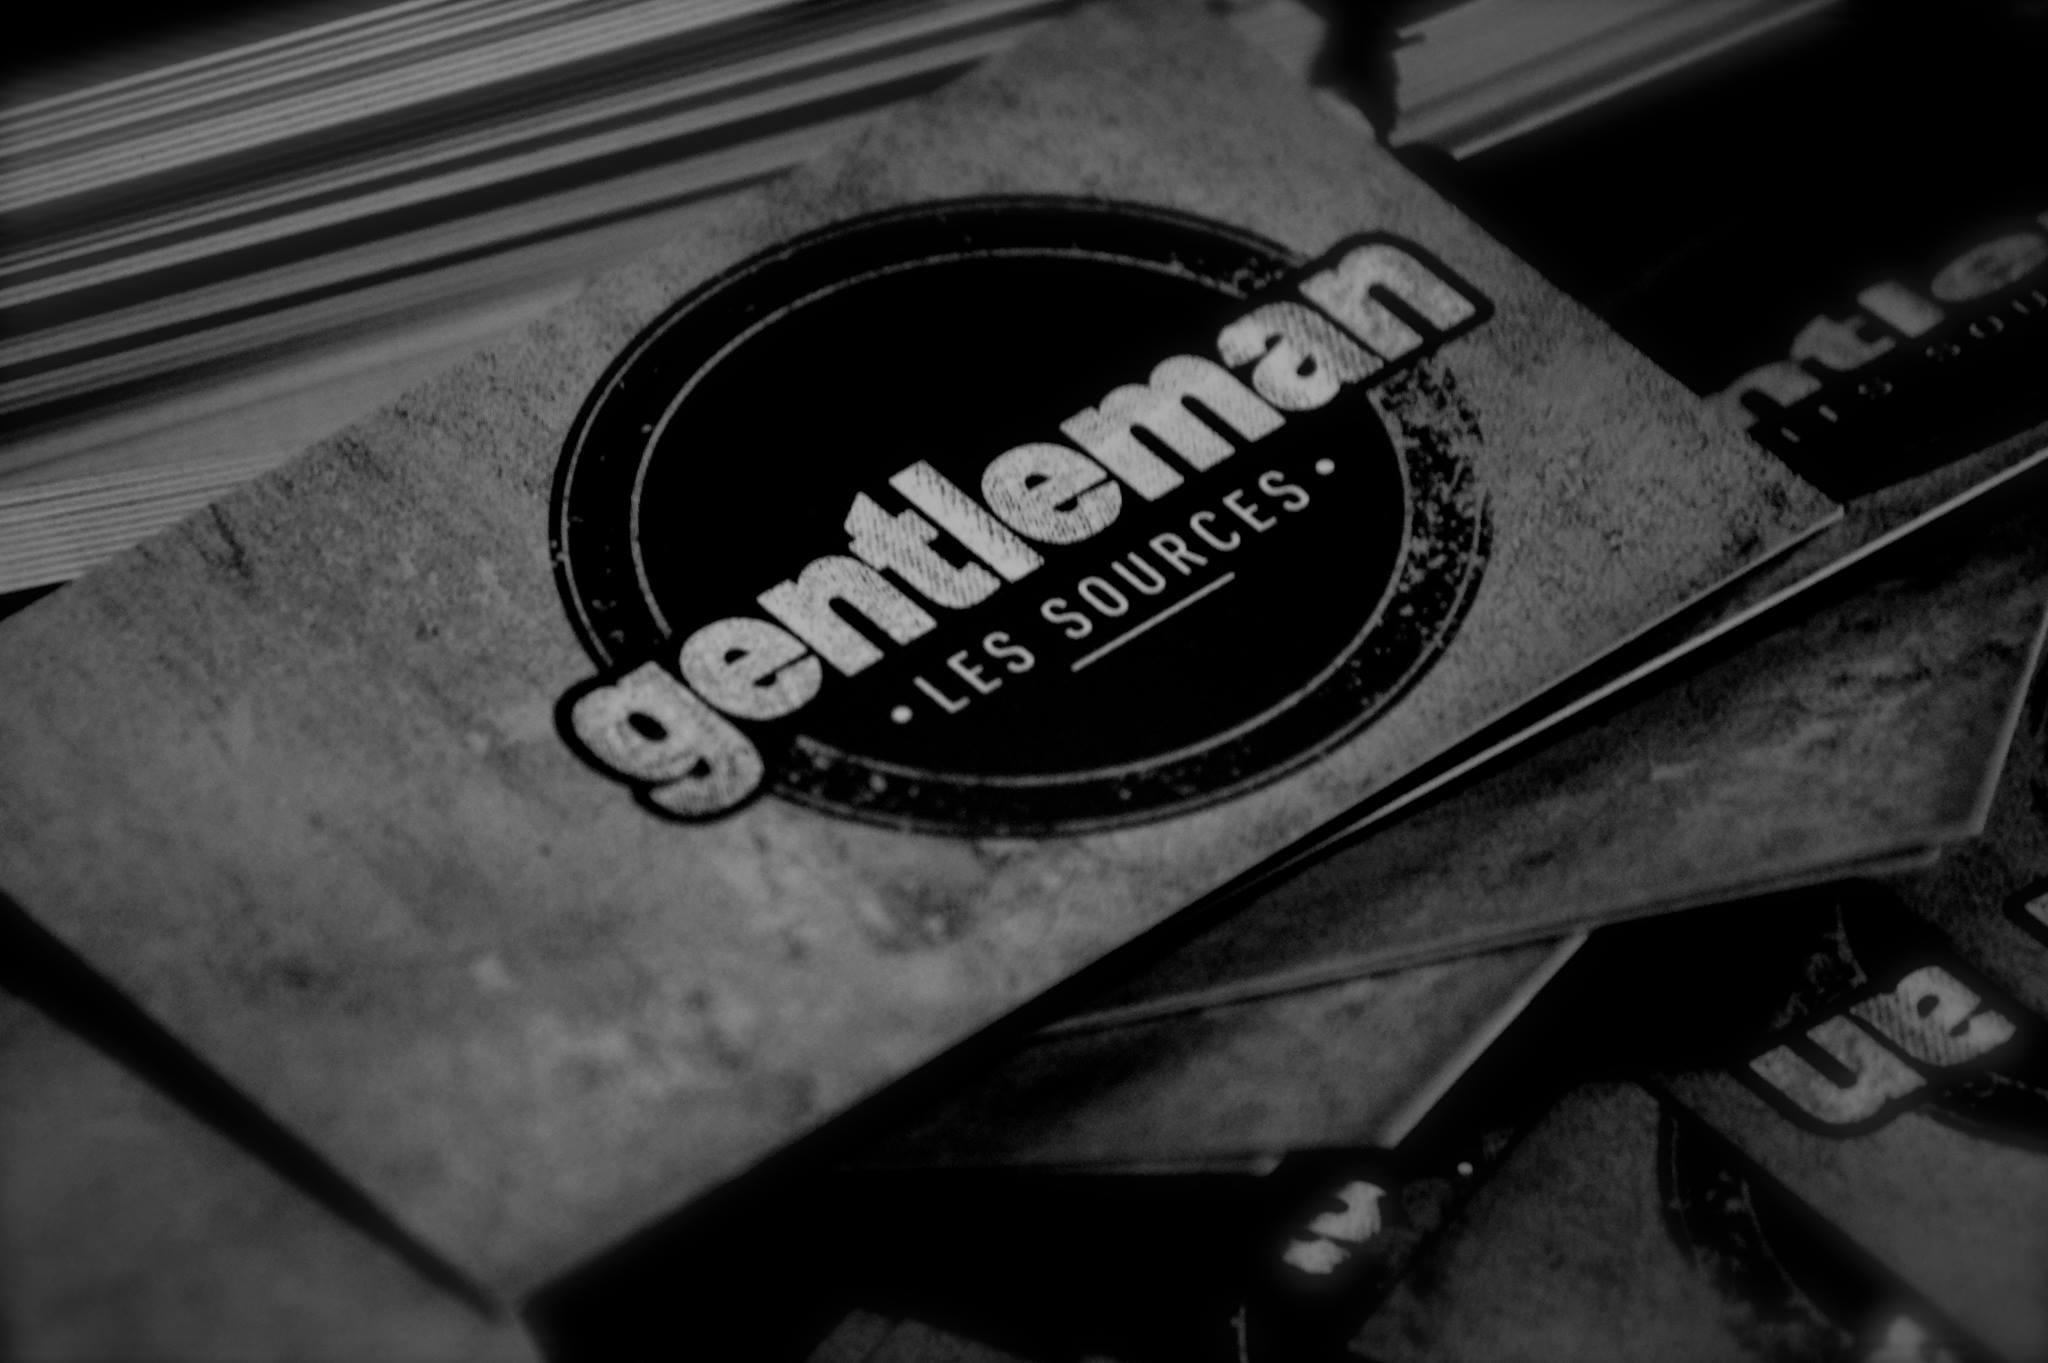 Gentleman Les Sources